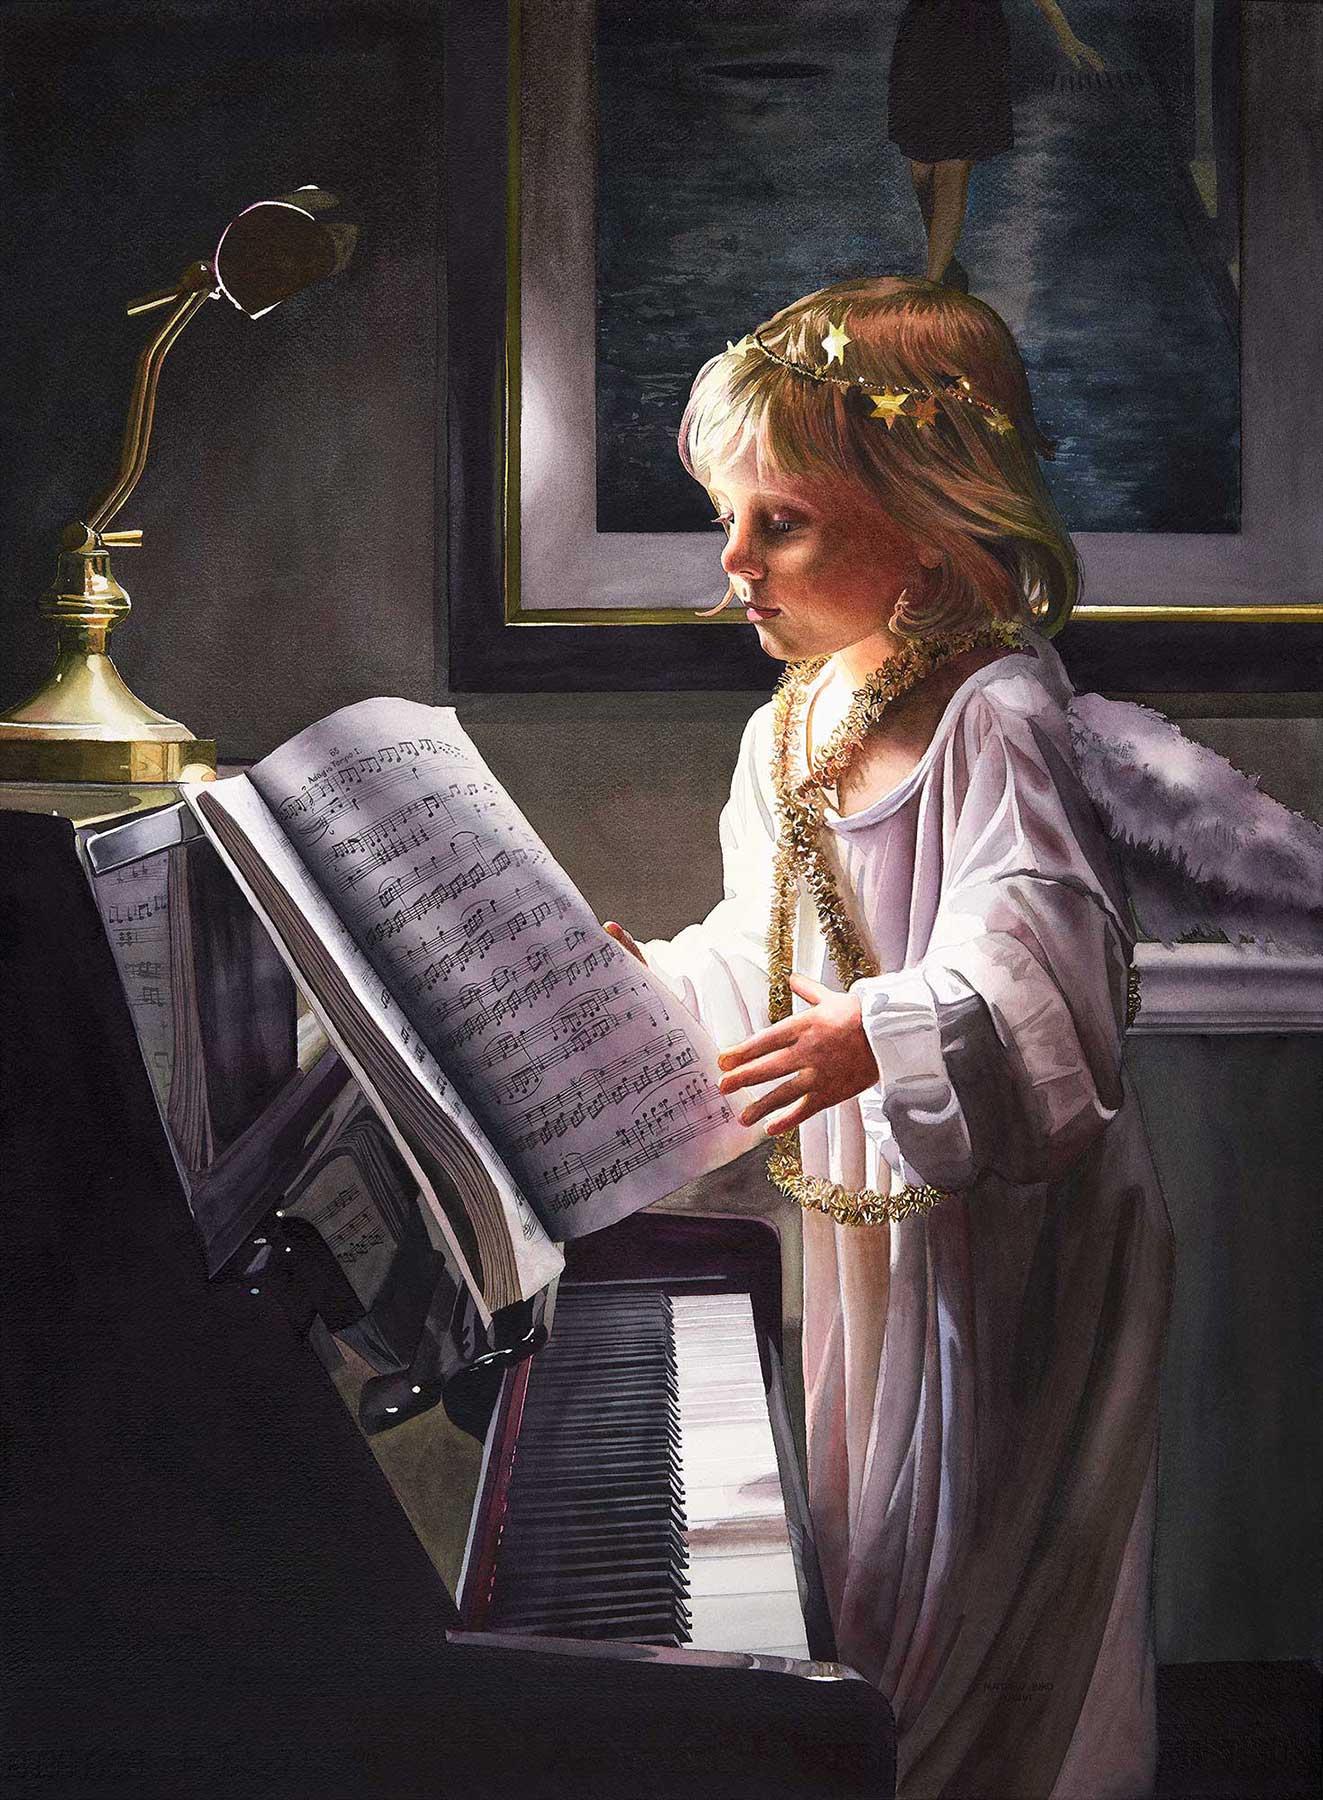 Matthew-Bird_Angel-Of-Music.jpg